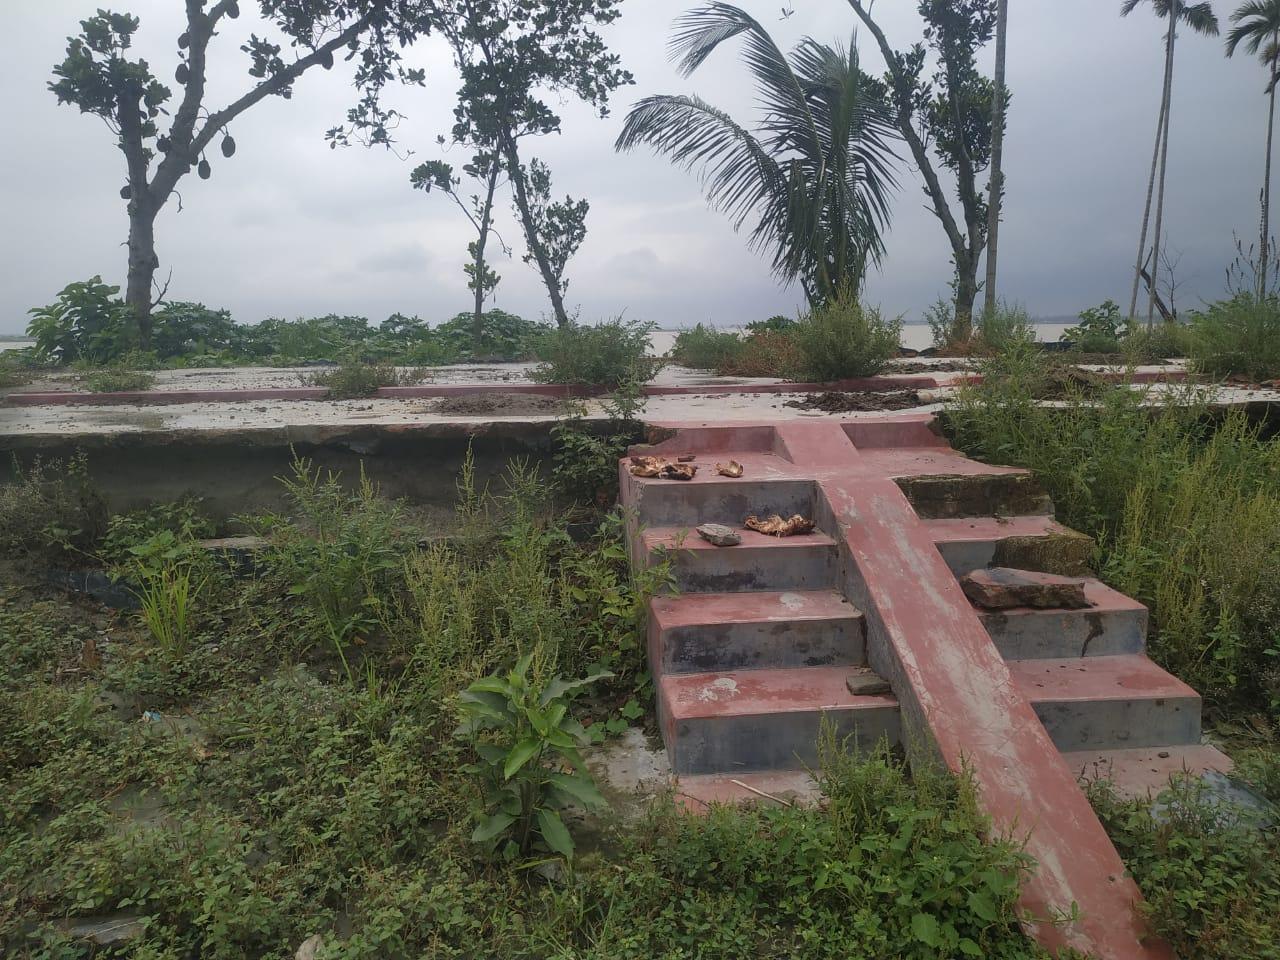 Abandoned homestead, Nayachar village, Kurigram district, Bangladesh